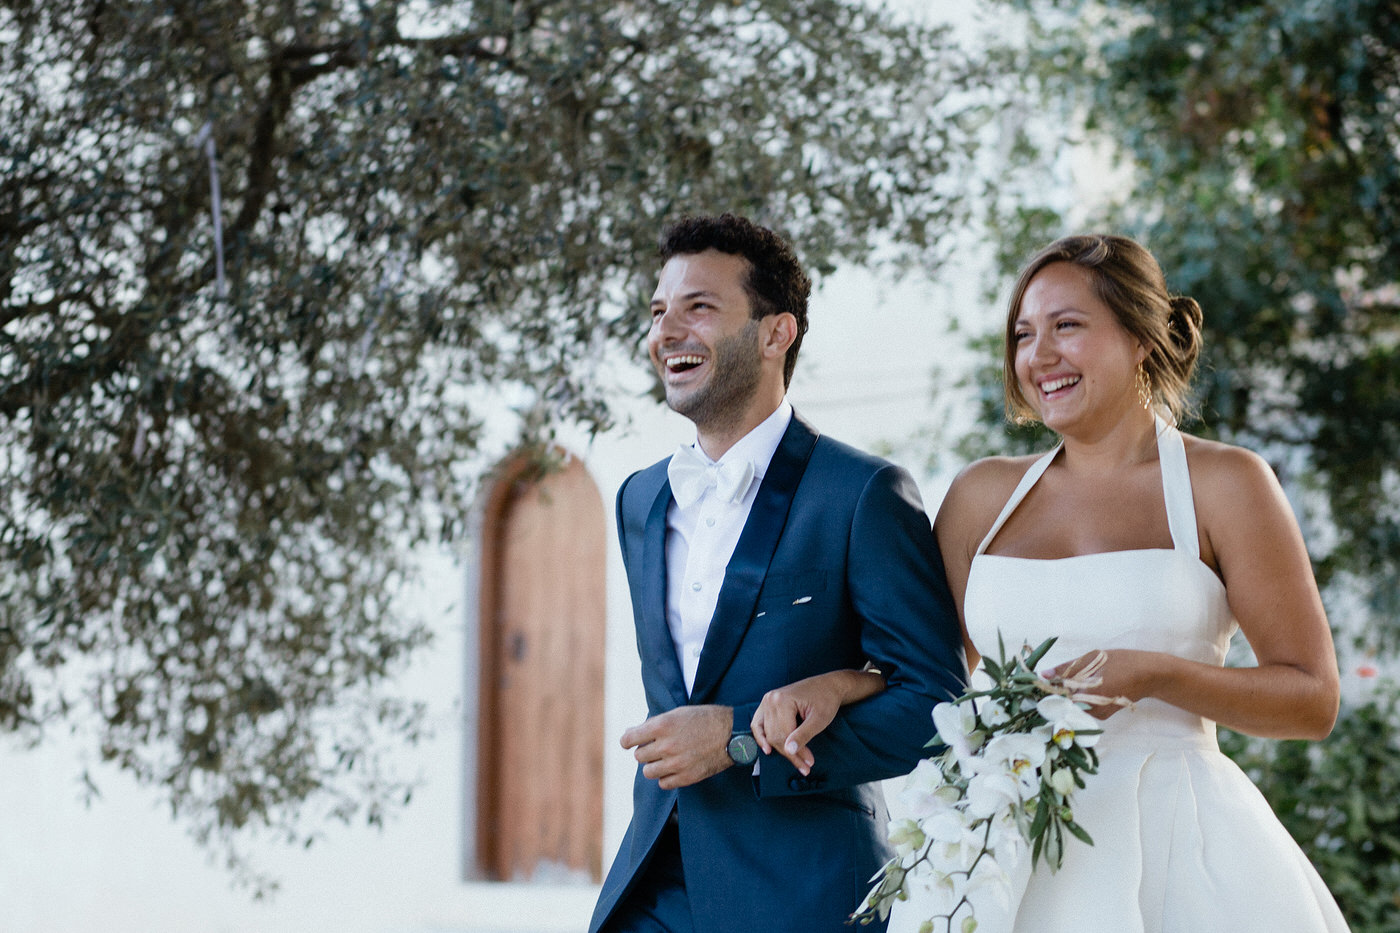 cyprus-wedding-photographer-21.JPG